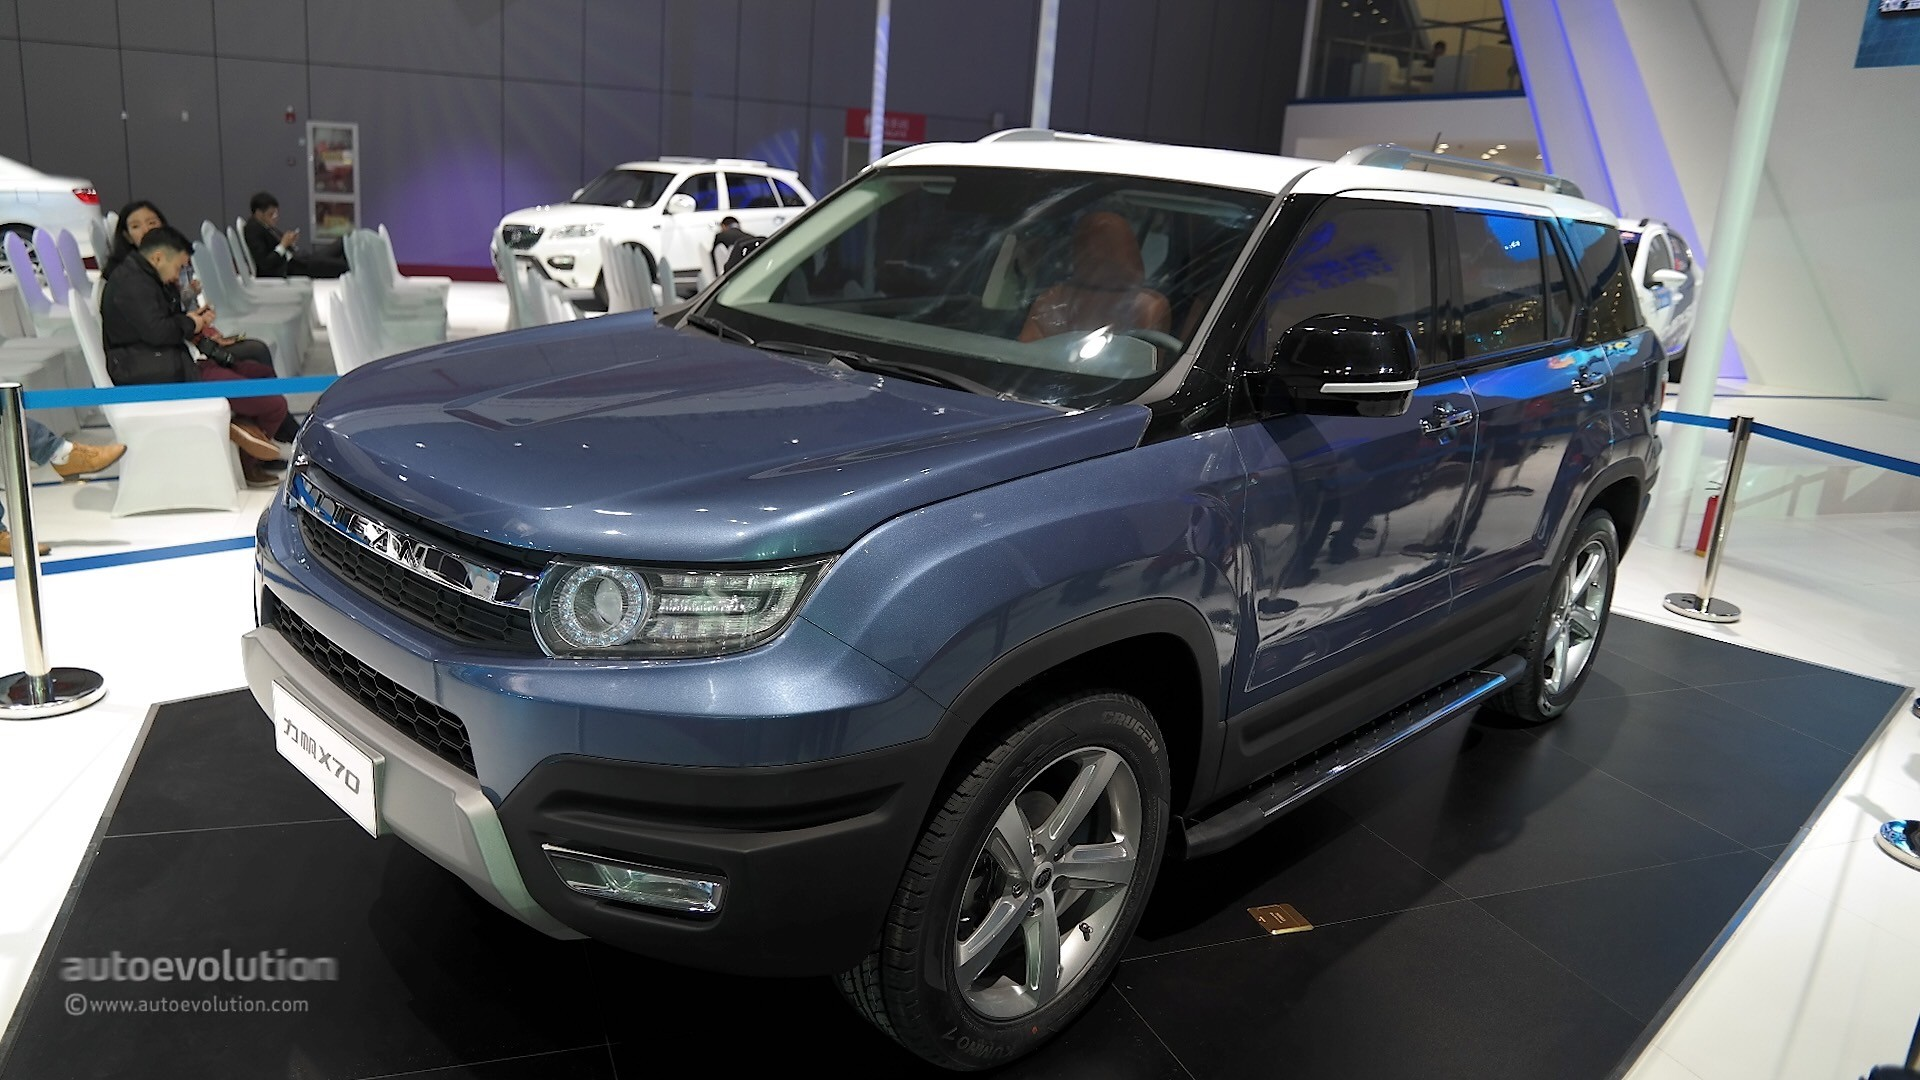 Lifan X70 SUV Concept Takes a Bow at Auto Shanghai 2015 ...